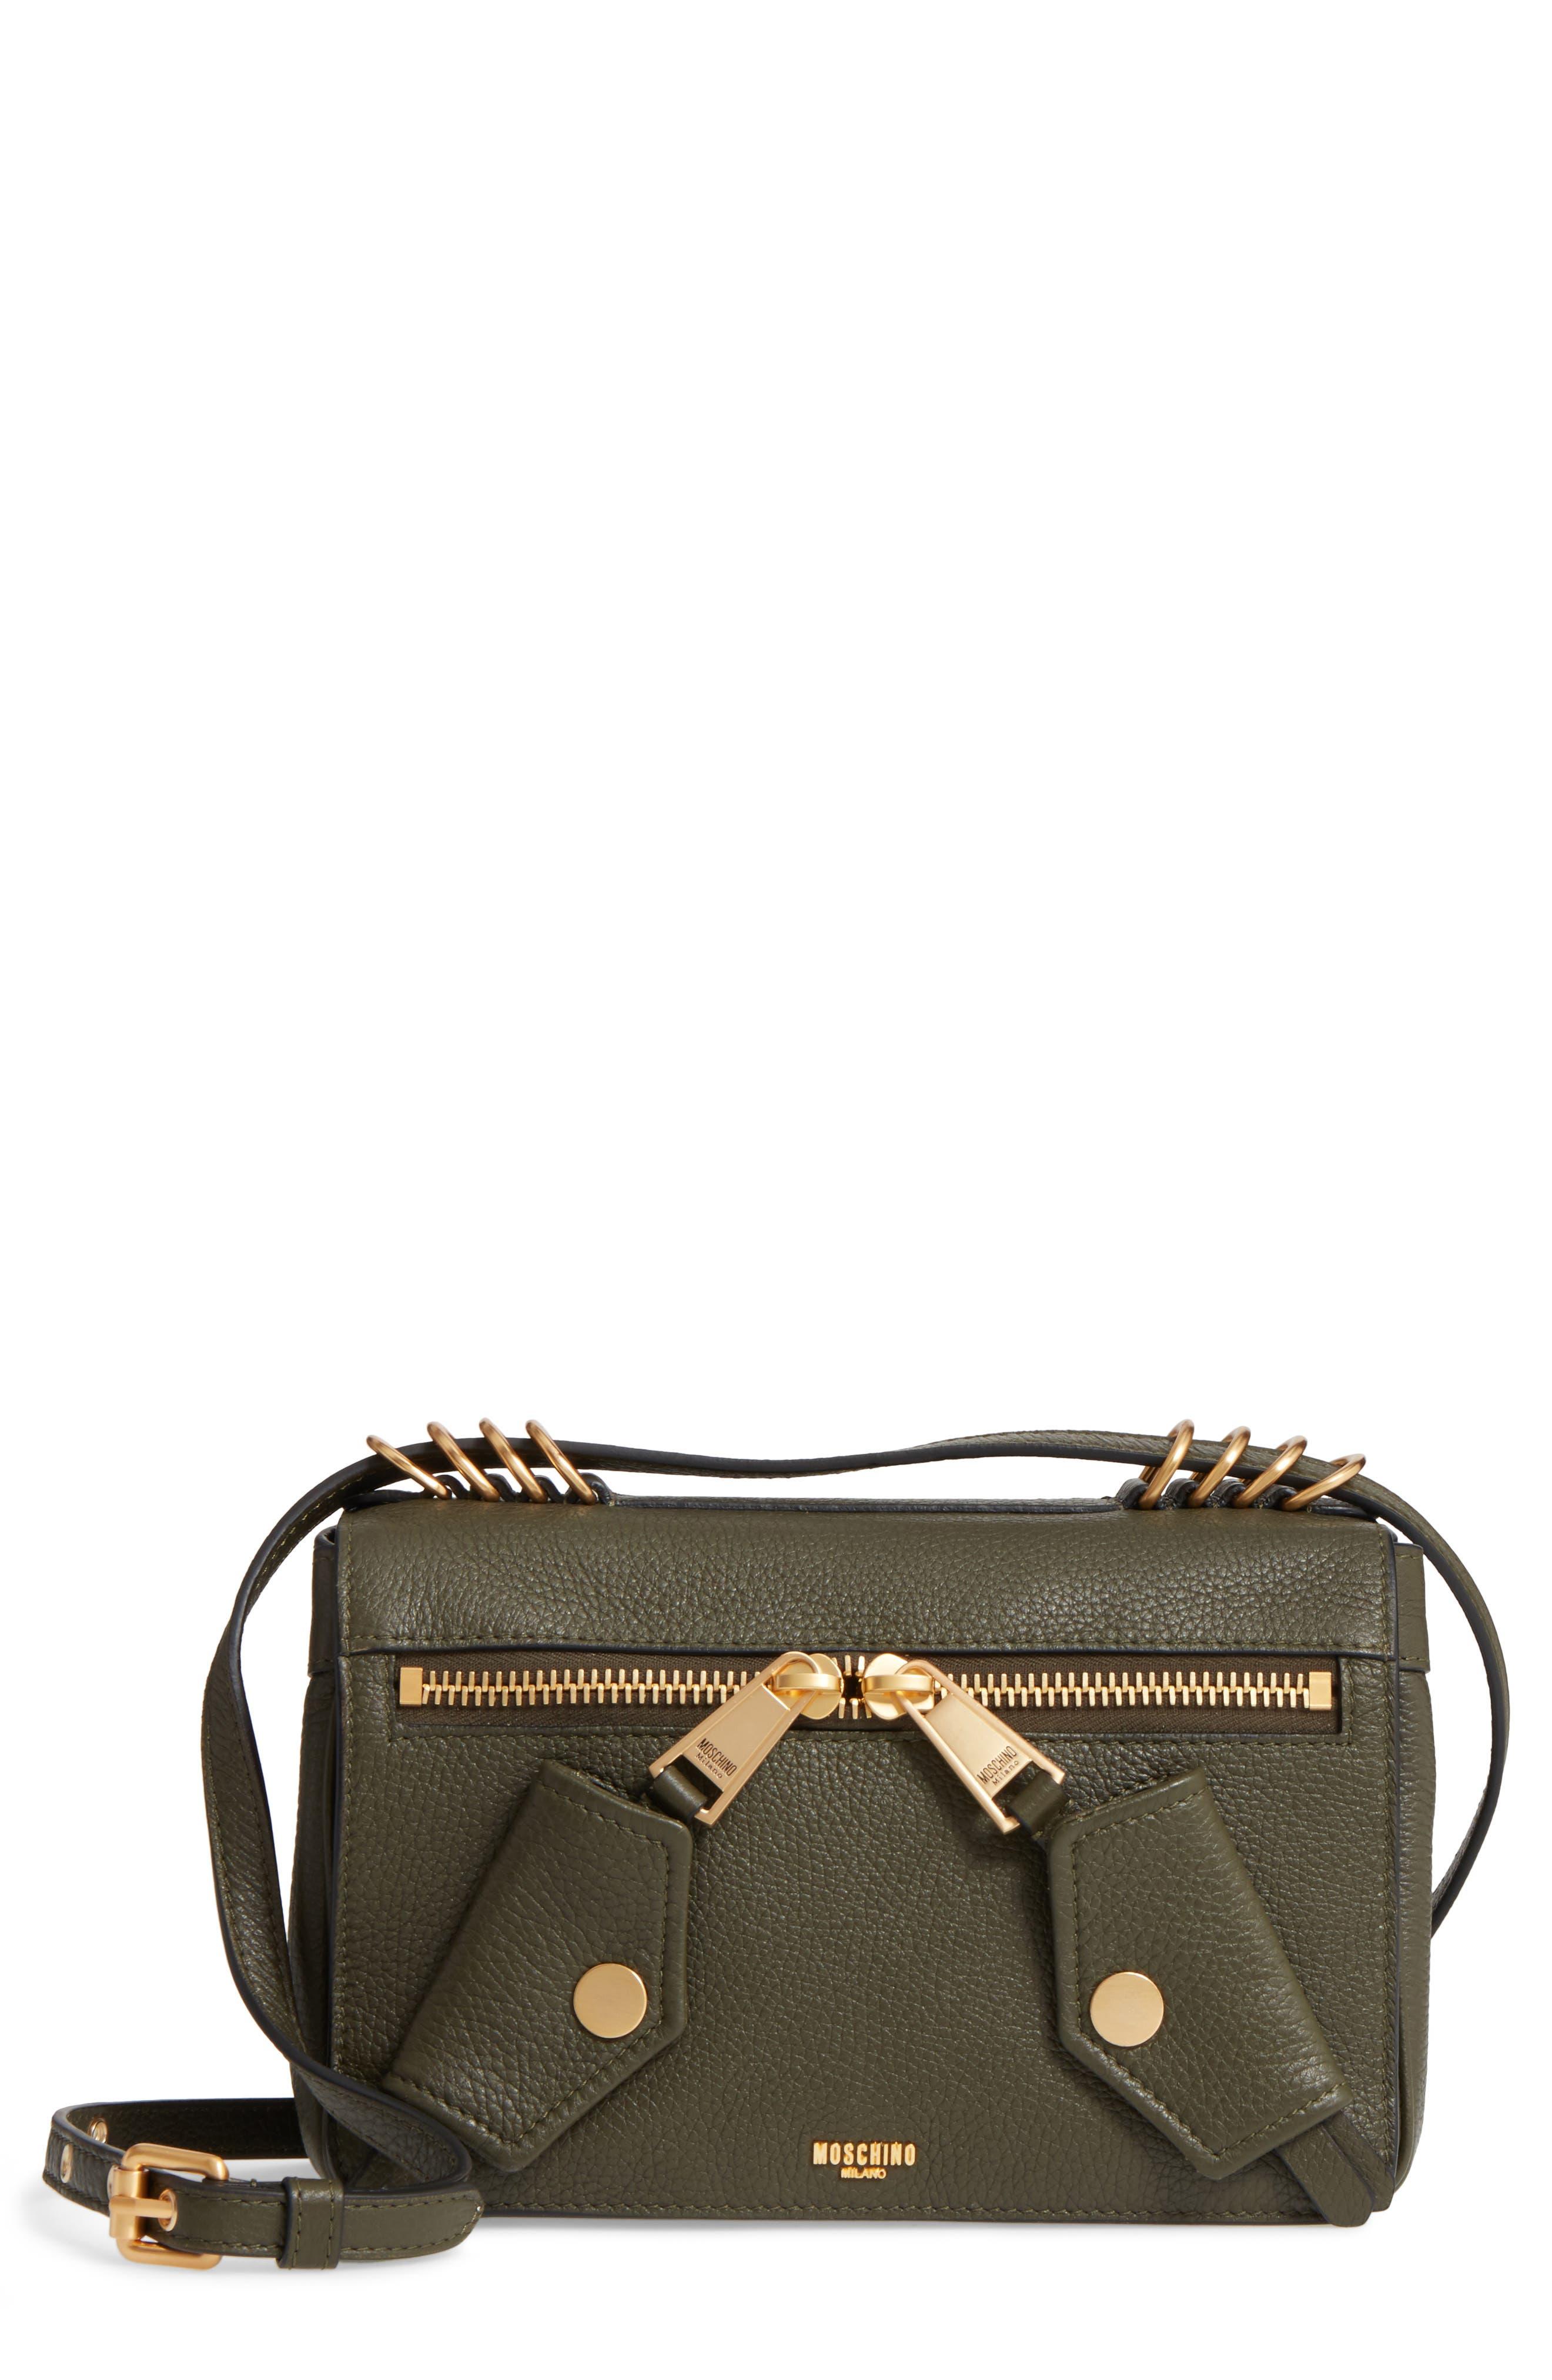 Moschino Grainy-B Leather Crossbody Bag